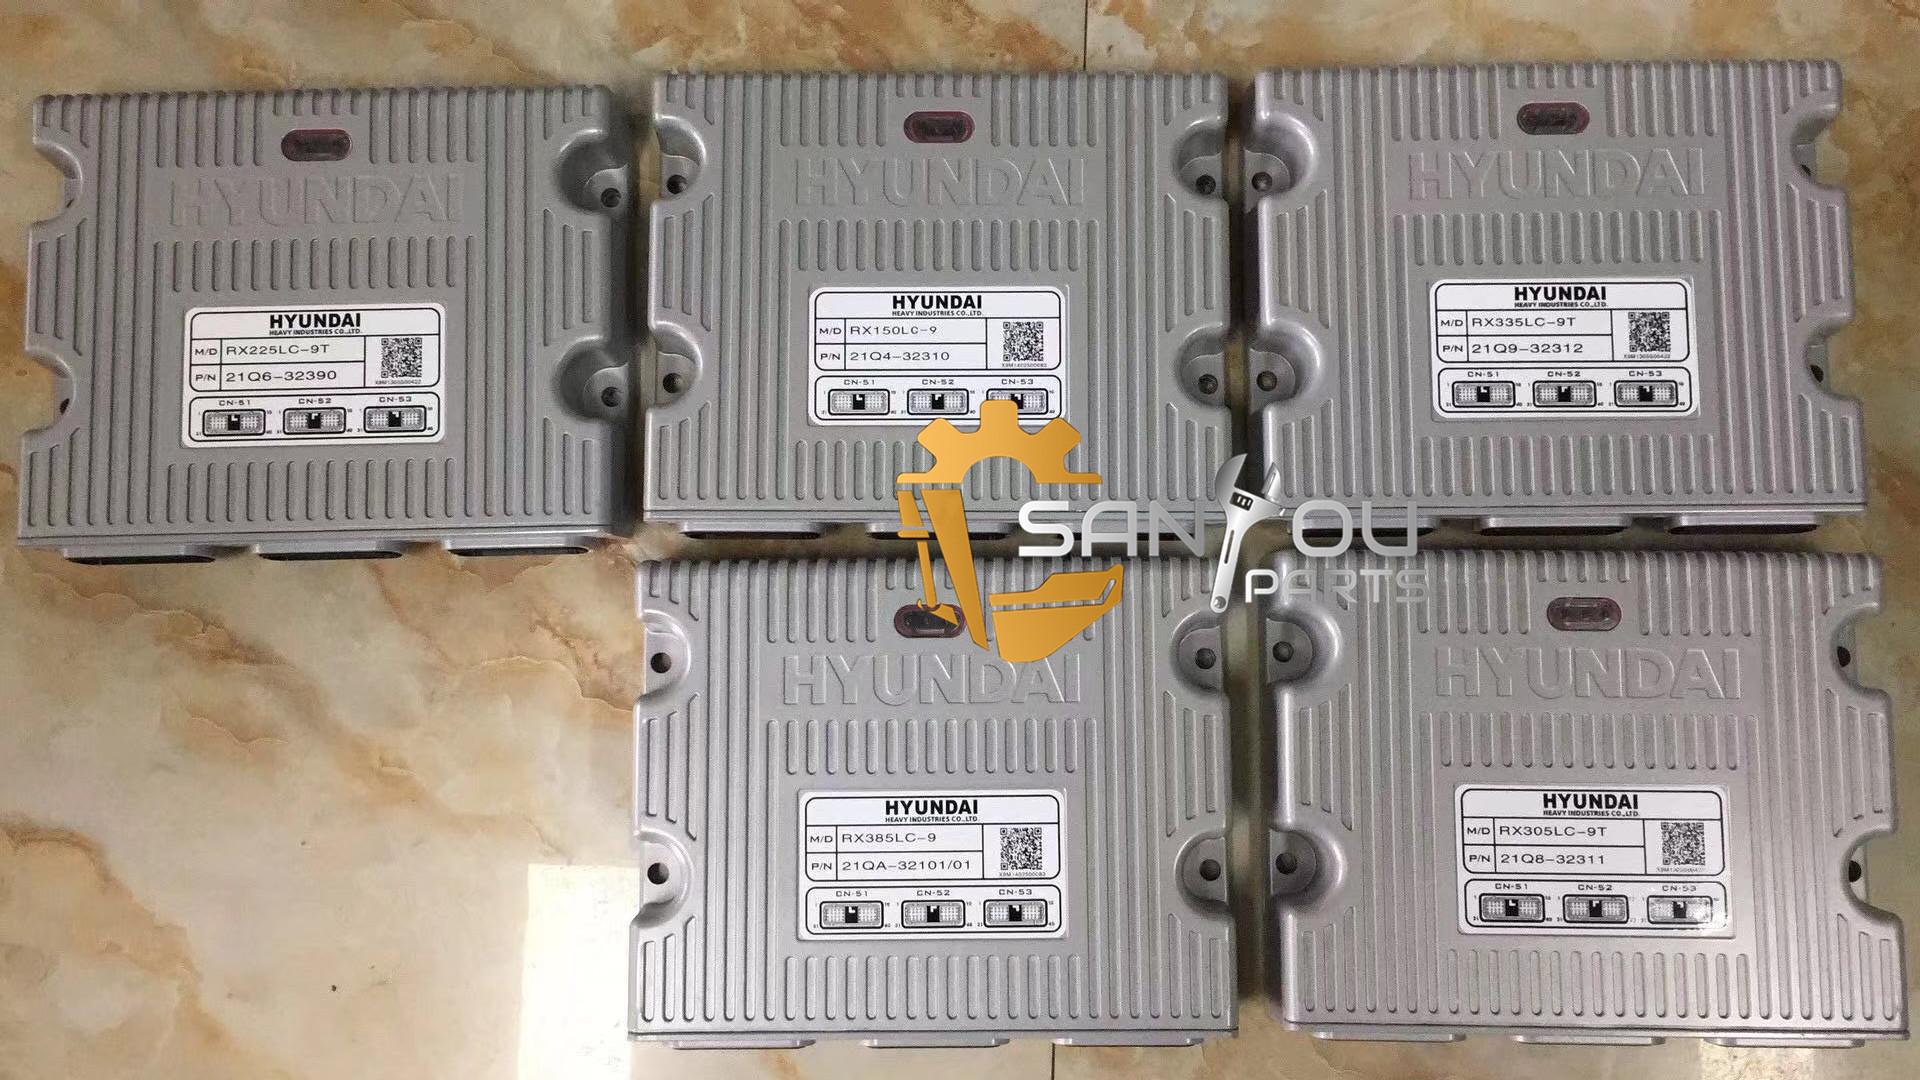 RX225-9 Controller 21Q6-32390 Controller RX225LC9T Controller